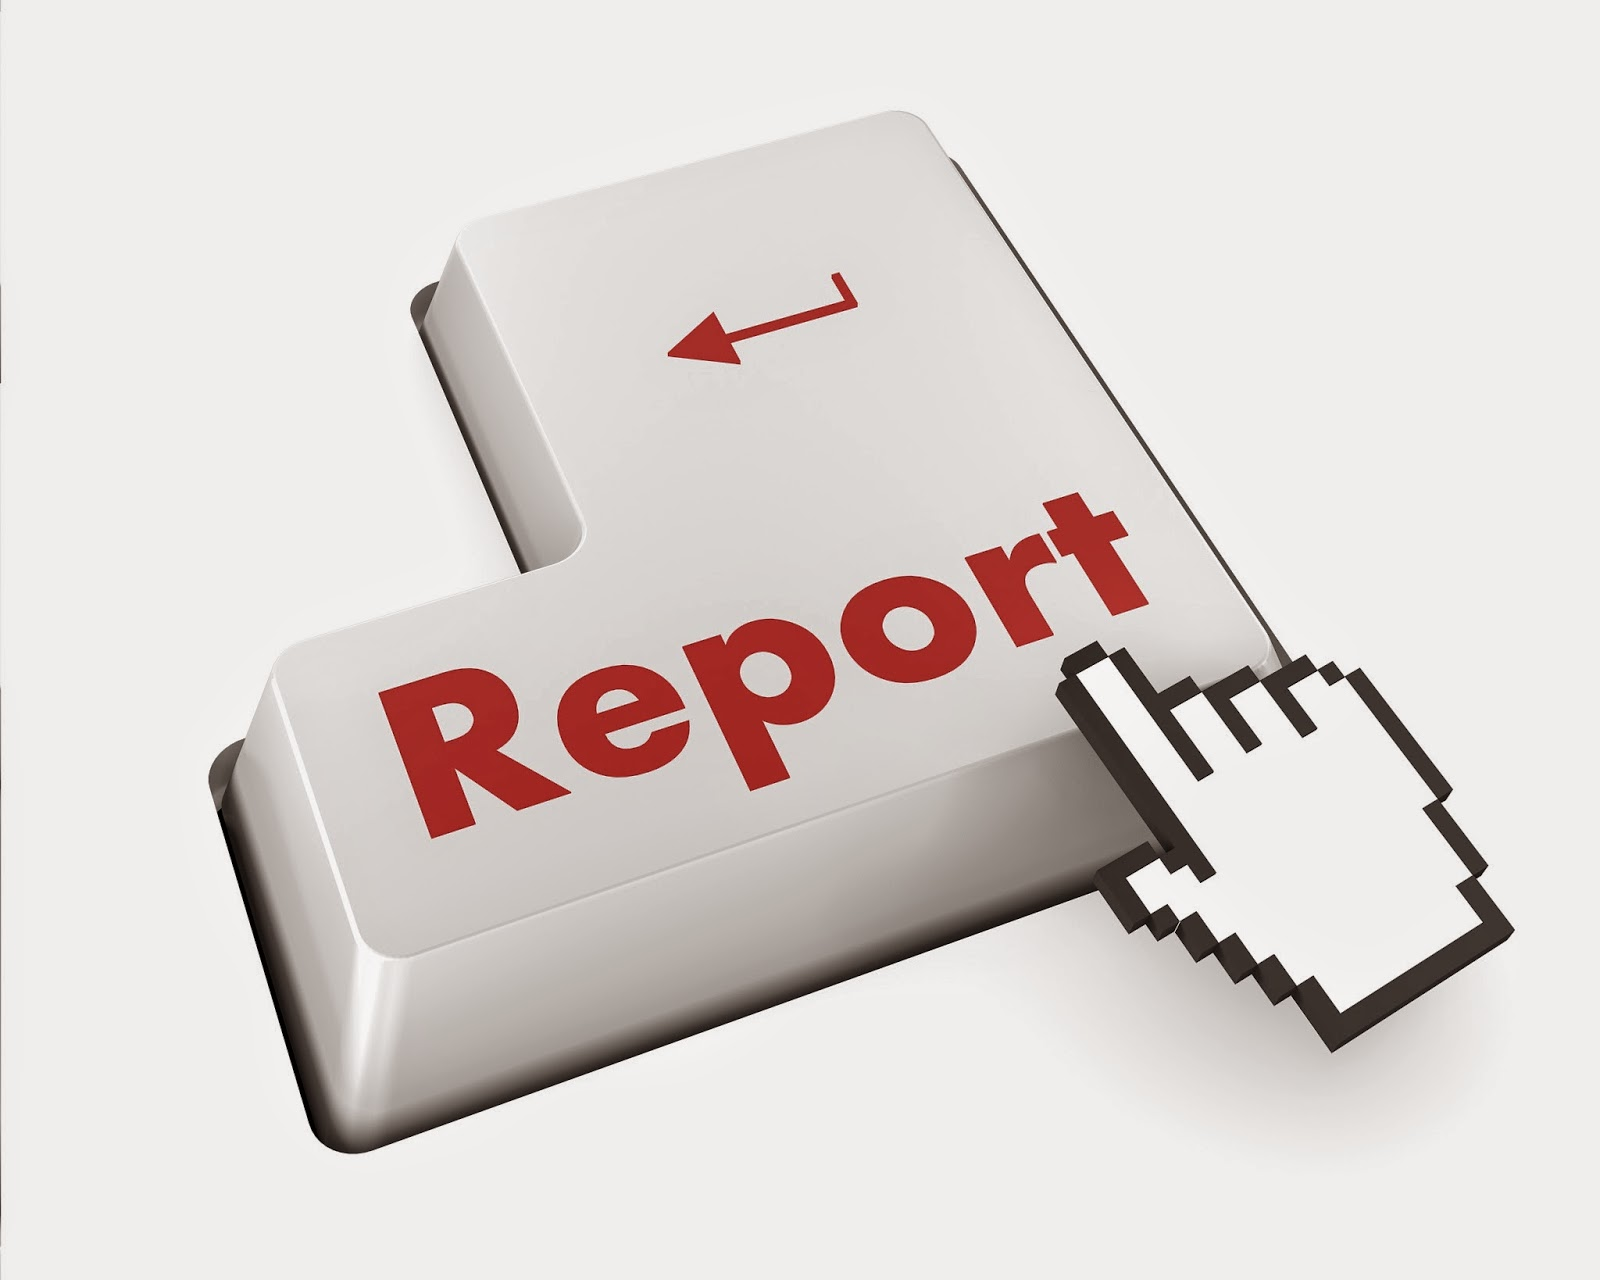 Report button